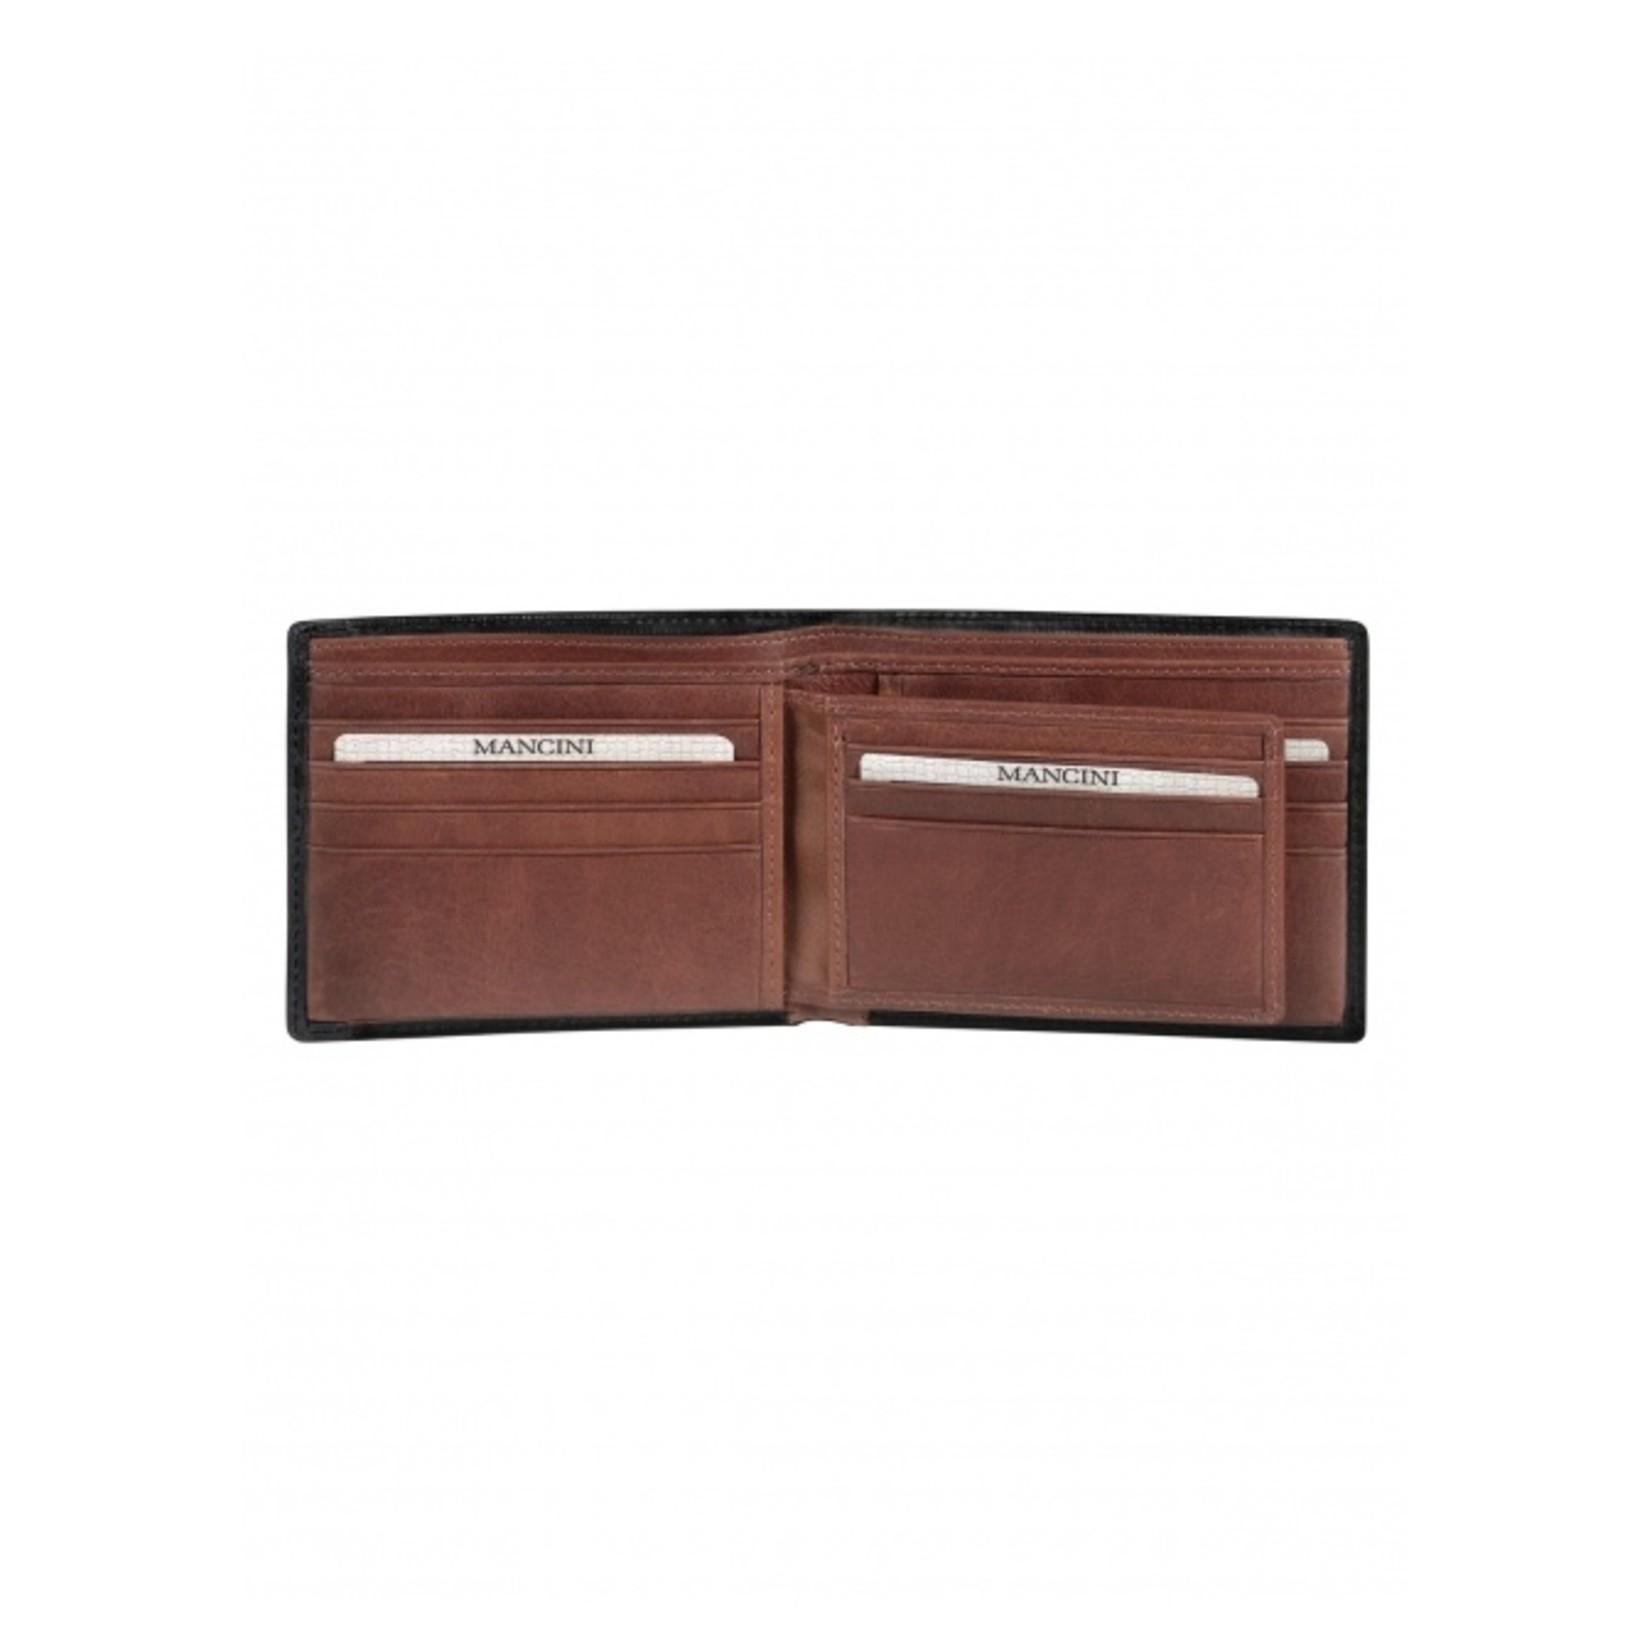 Mancini Mancini 8700852 Slimfold w/ Removable Passcase